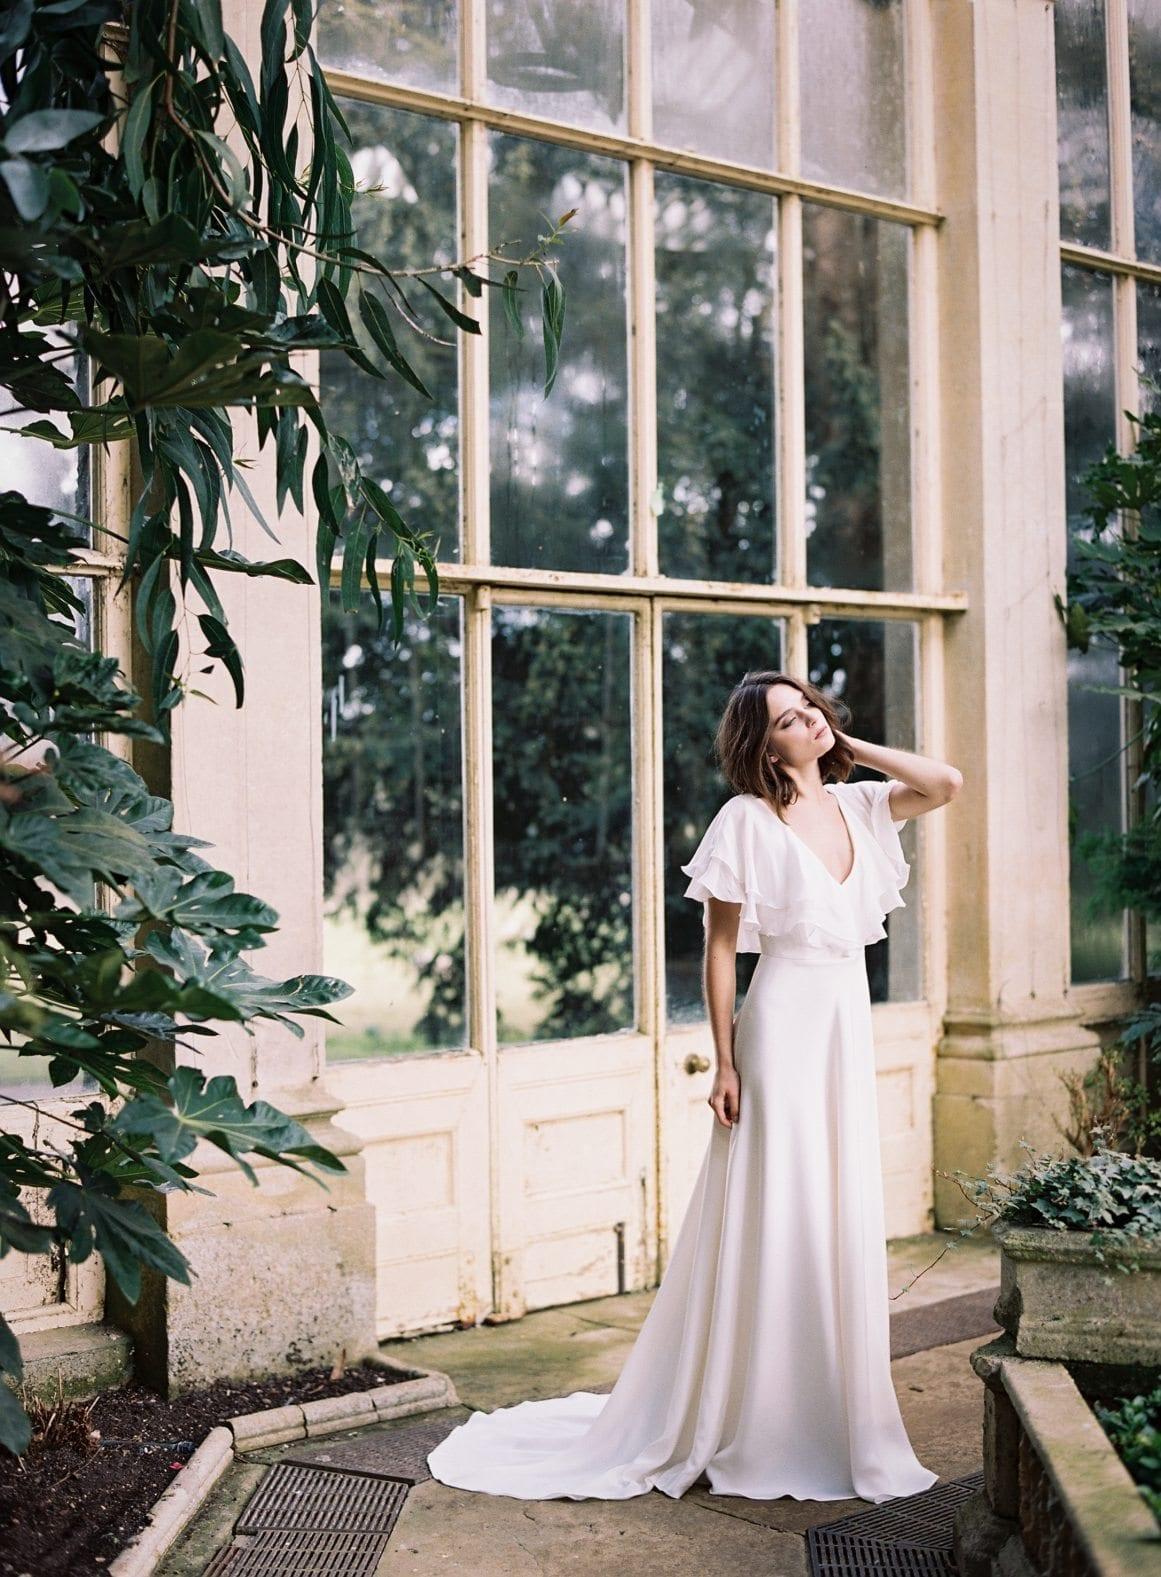 Evelin Wedding Dress - Cherry Williams, Bridalwear London